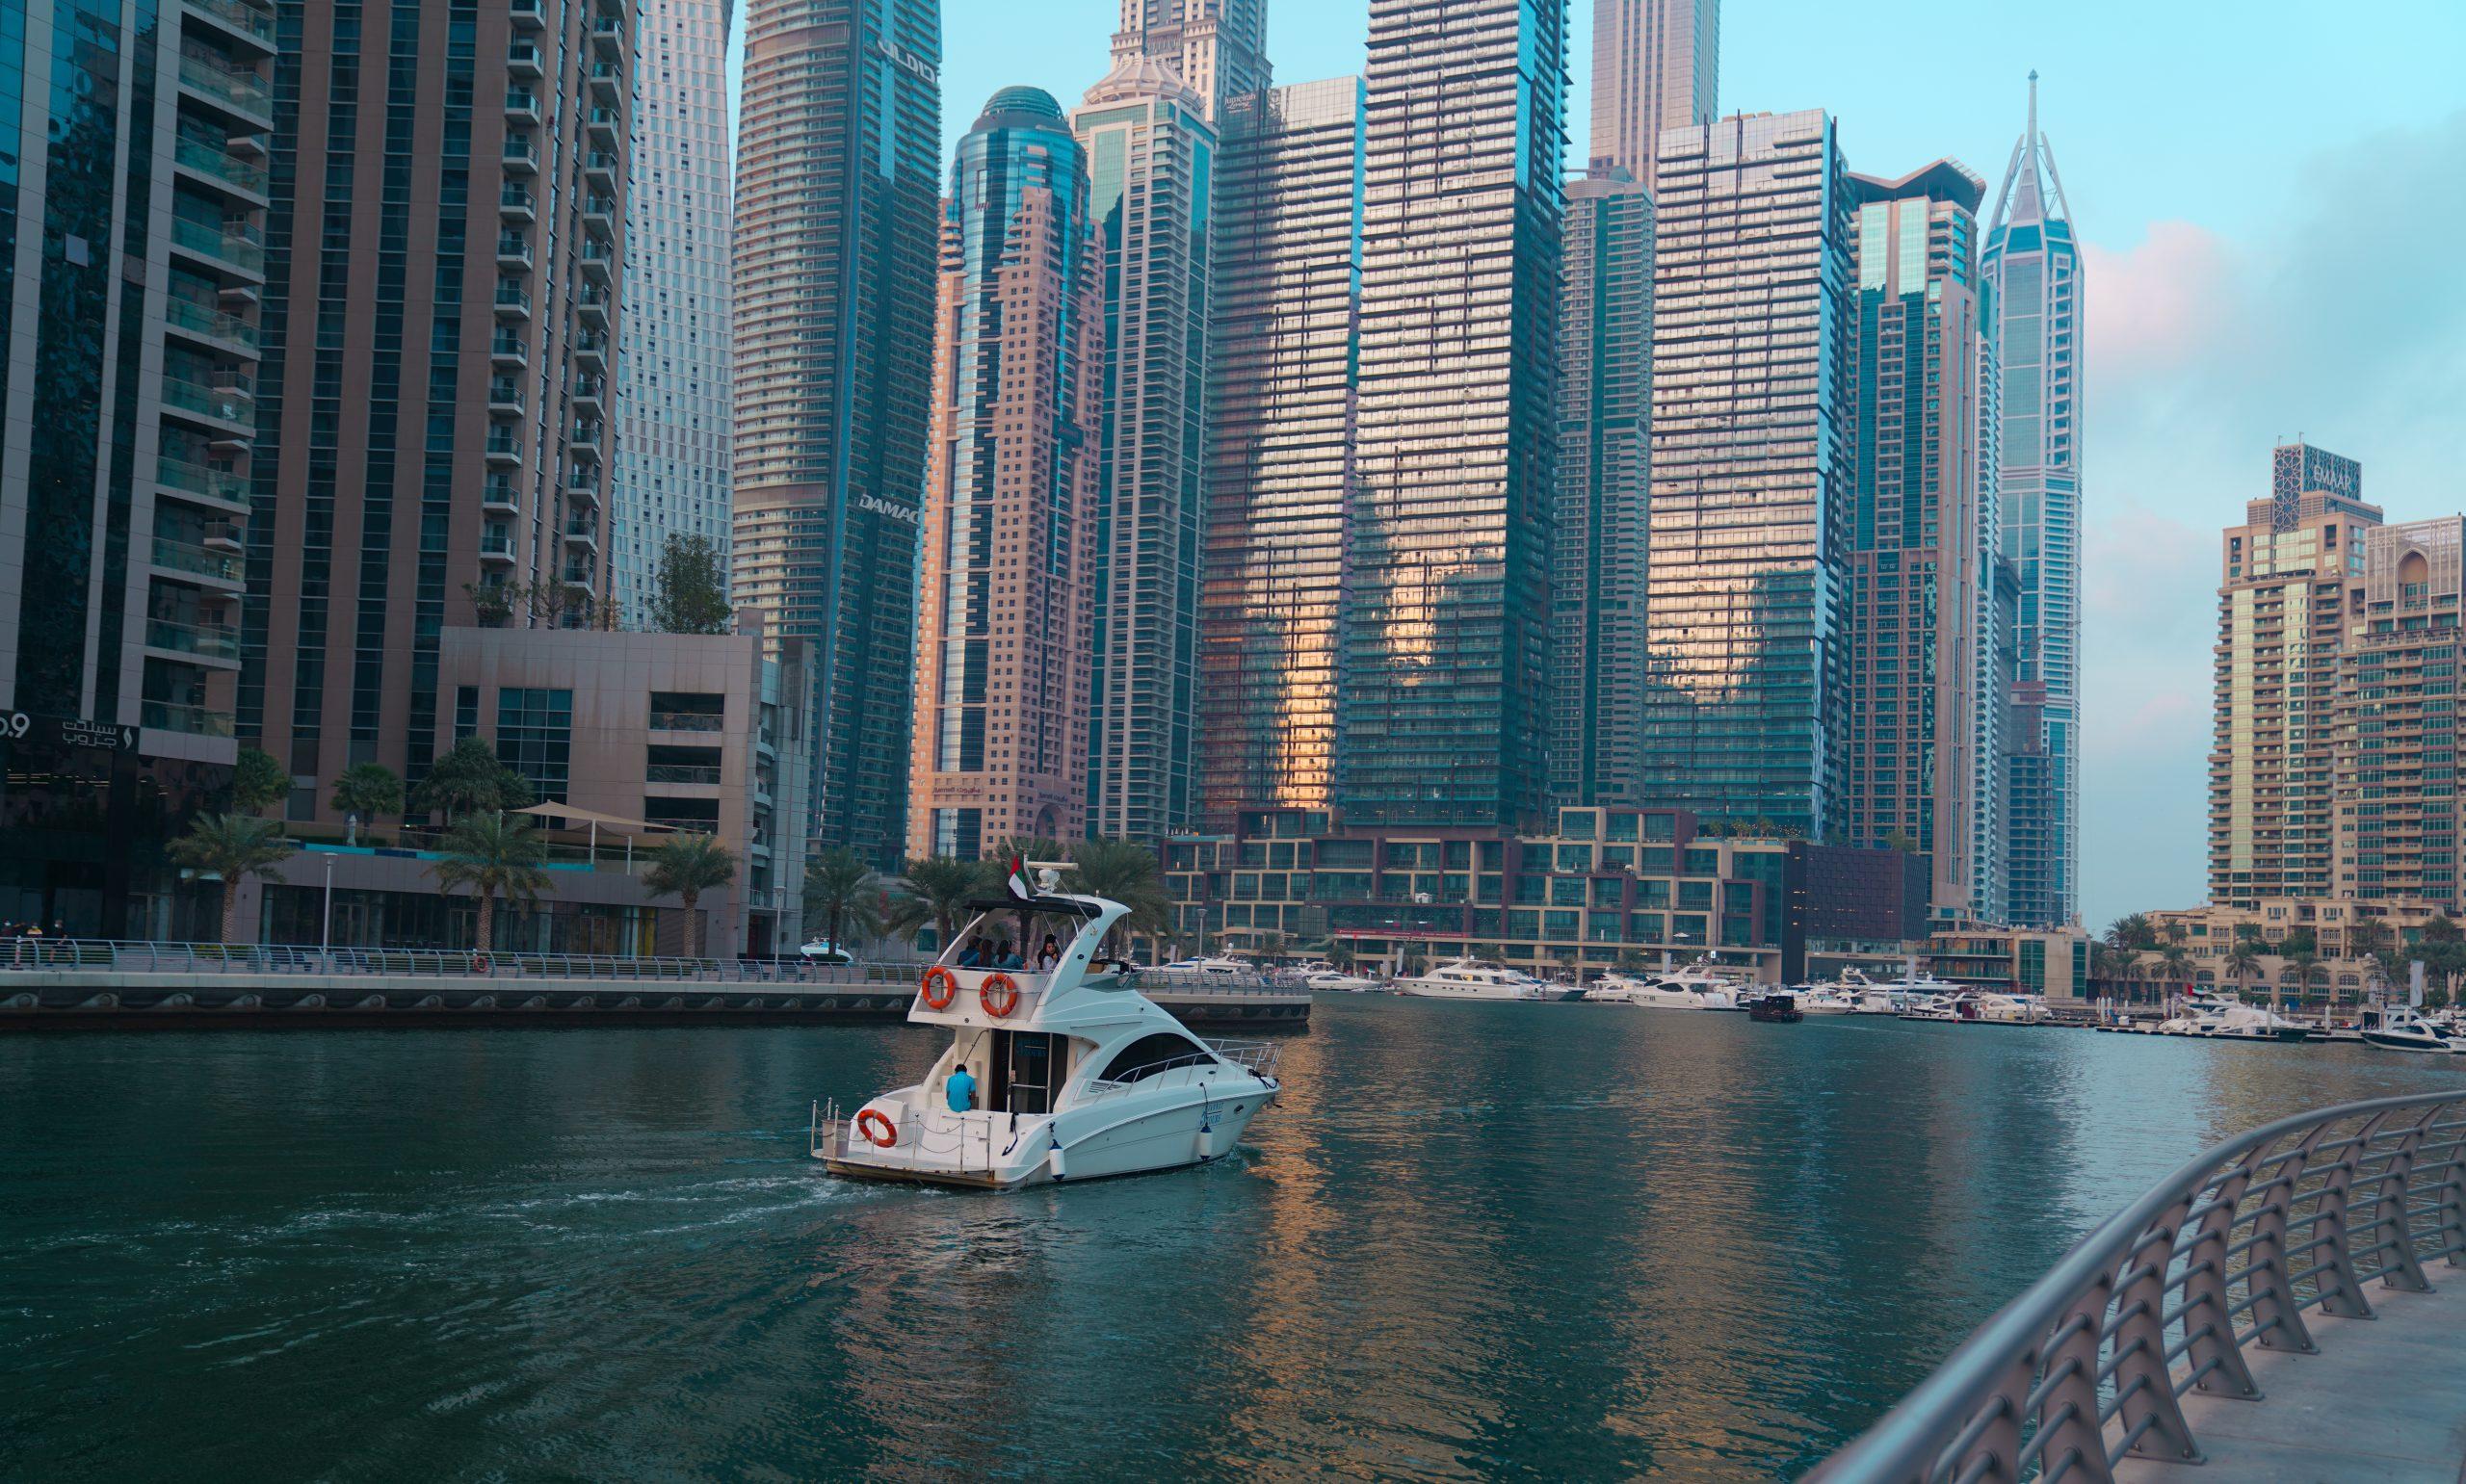 A water way in Dubai city